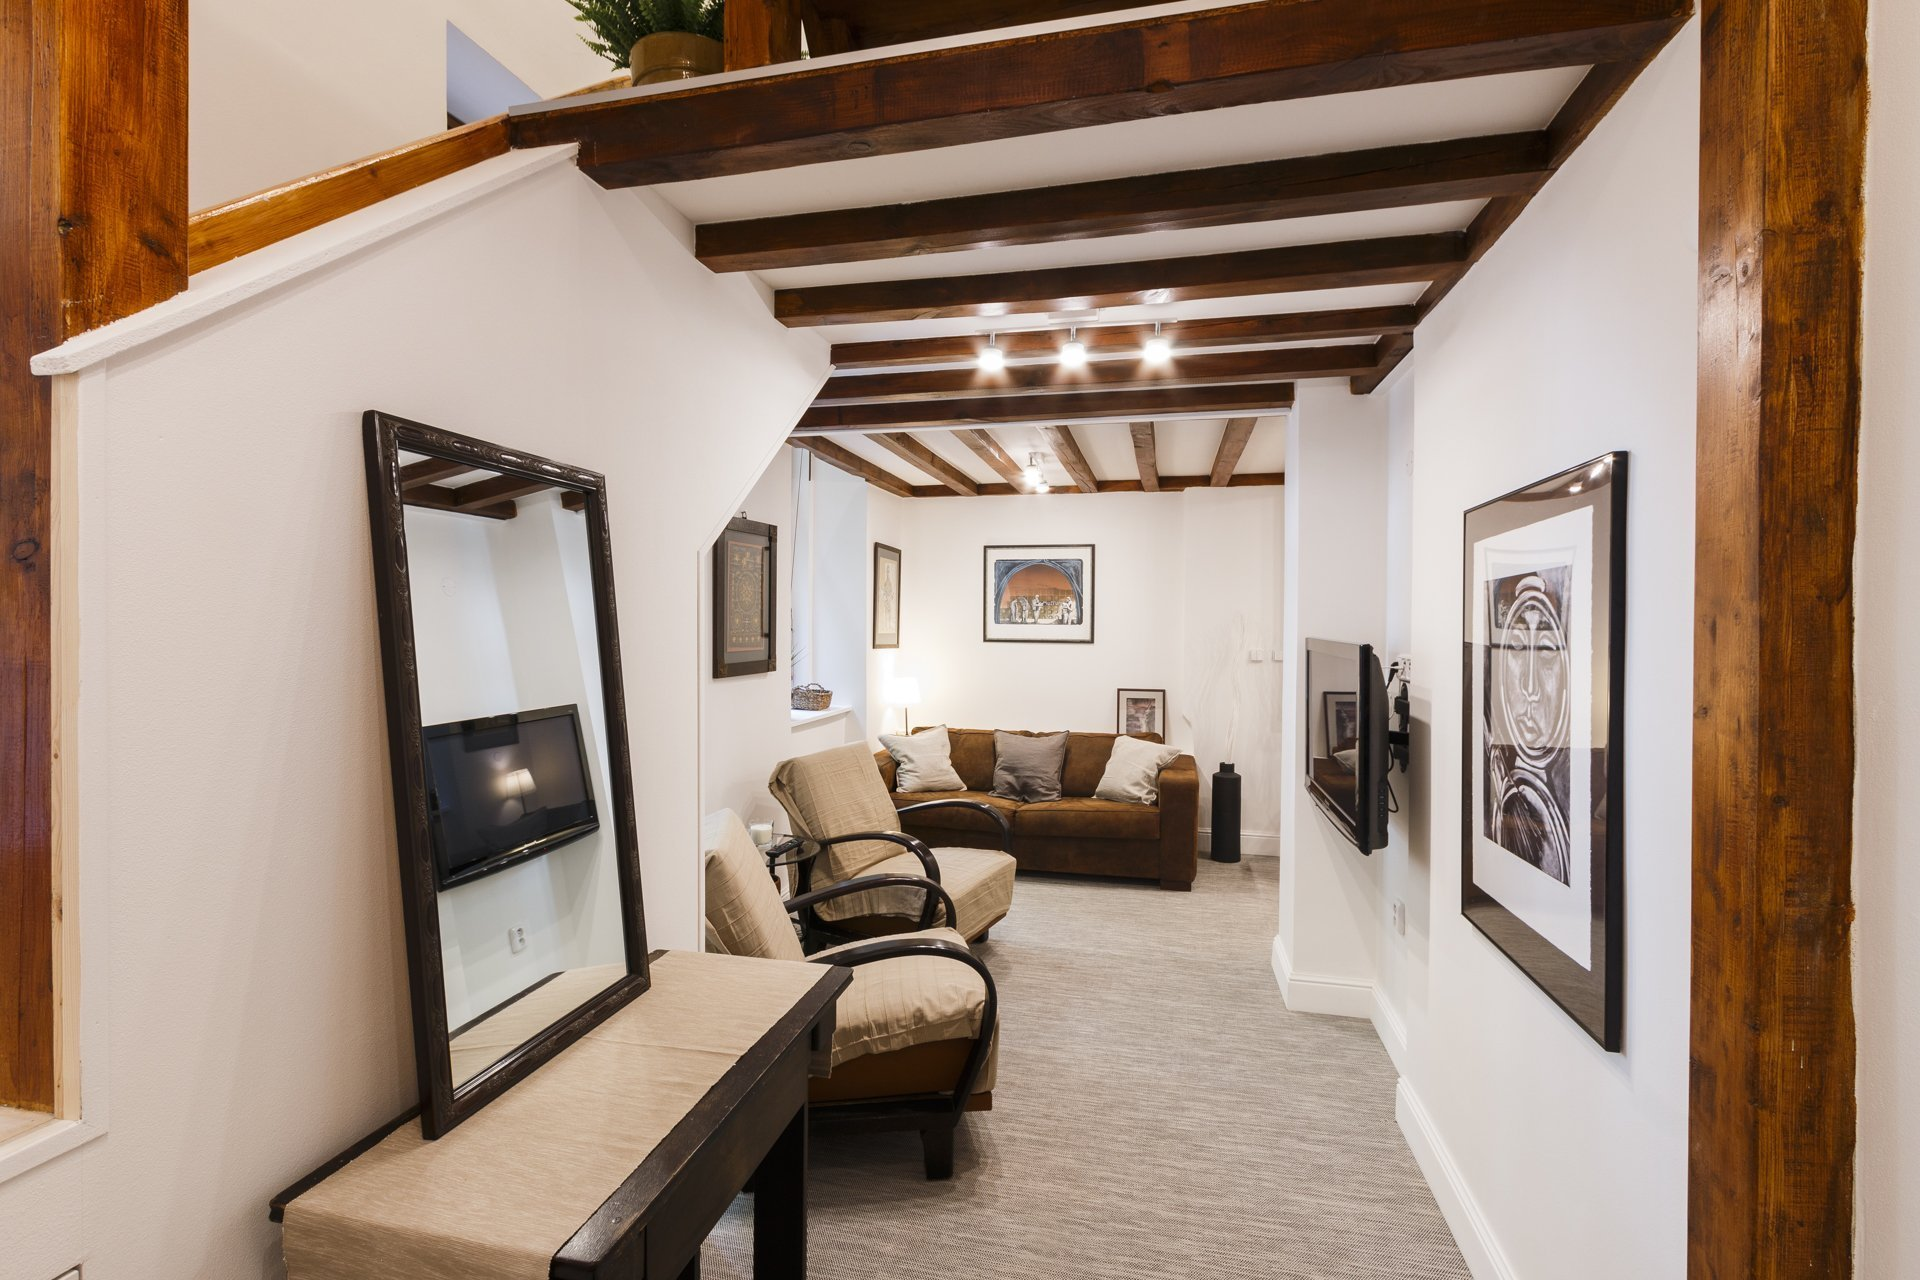 Interiér bytu pro krátkodobý pronájem